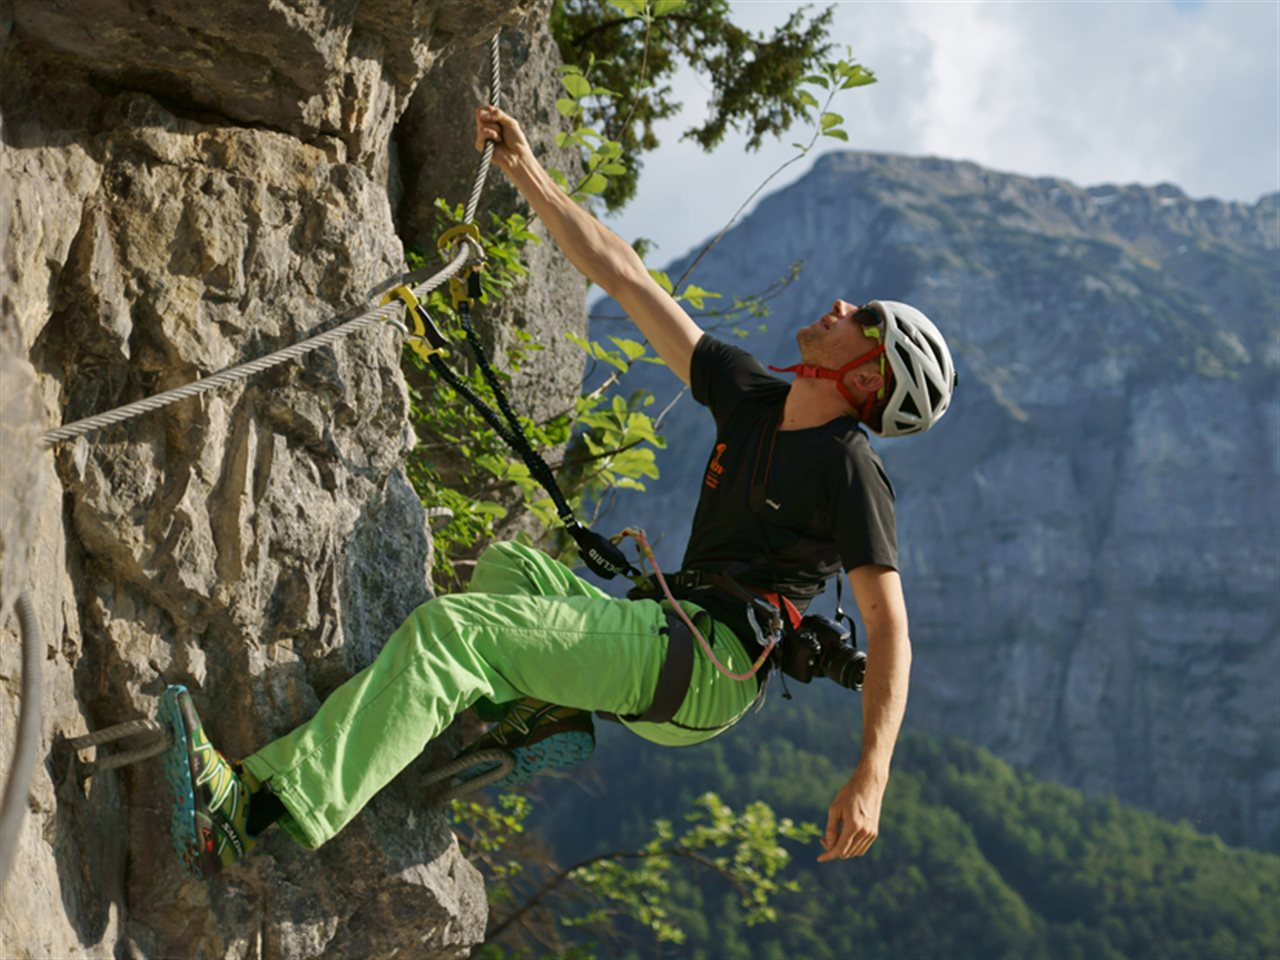 Klettersteig Englisch : Basic klettersteige training an introduction to technique and